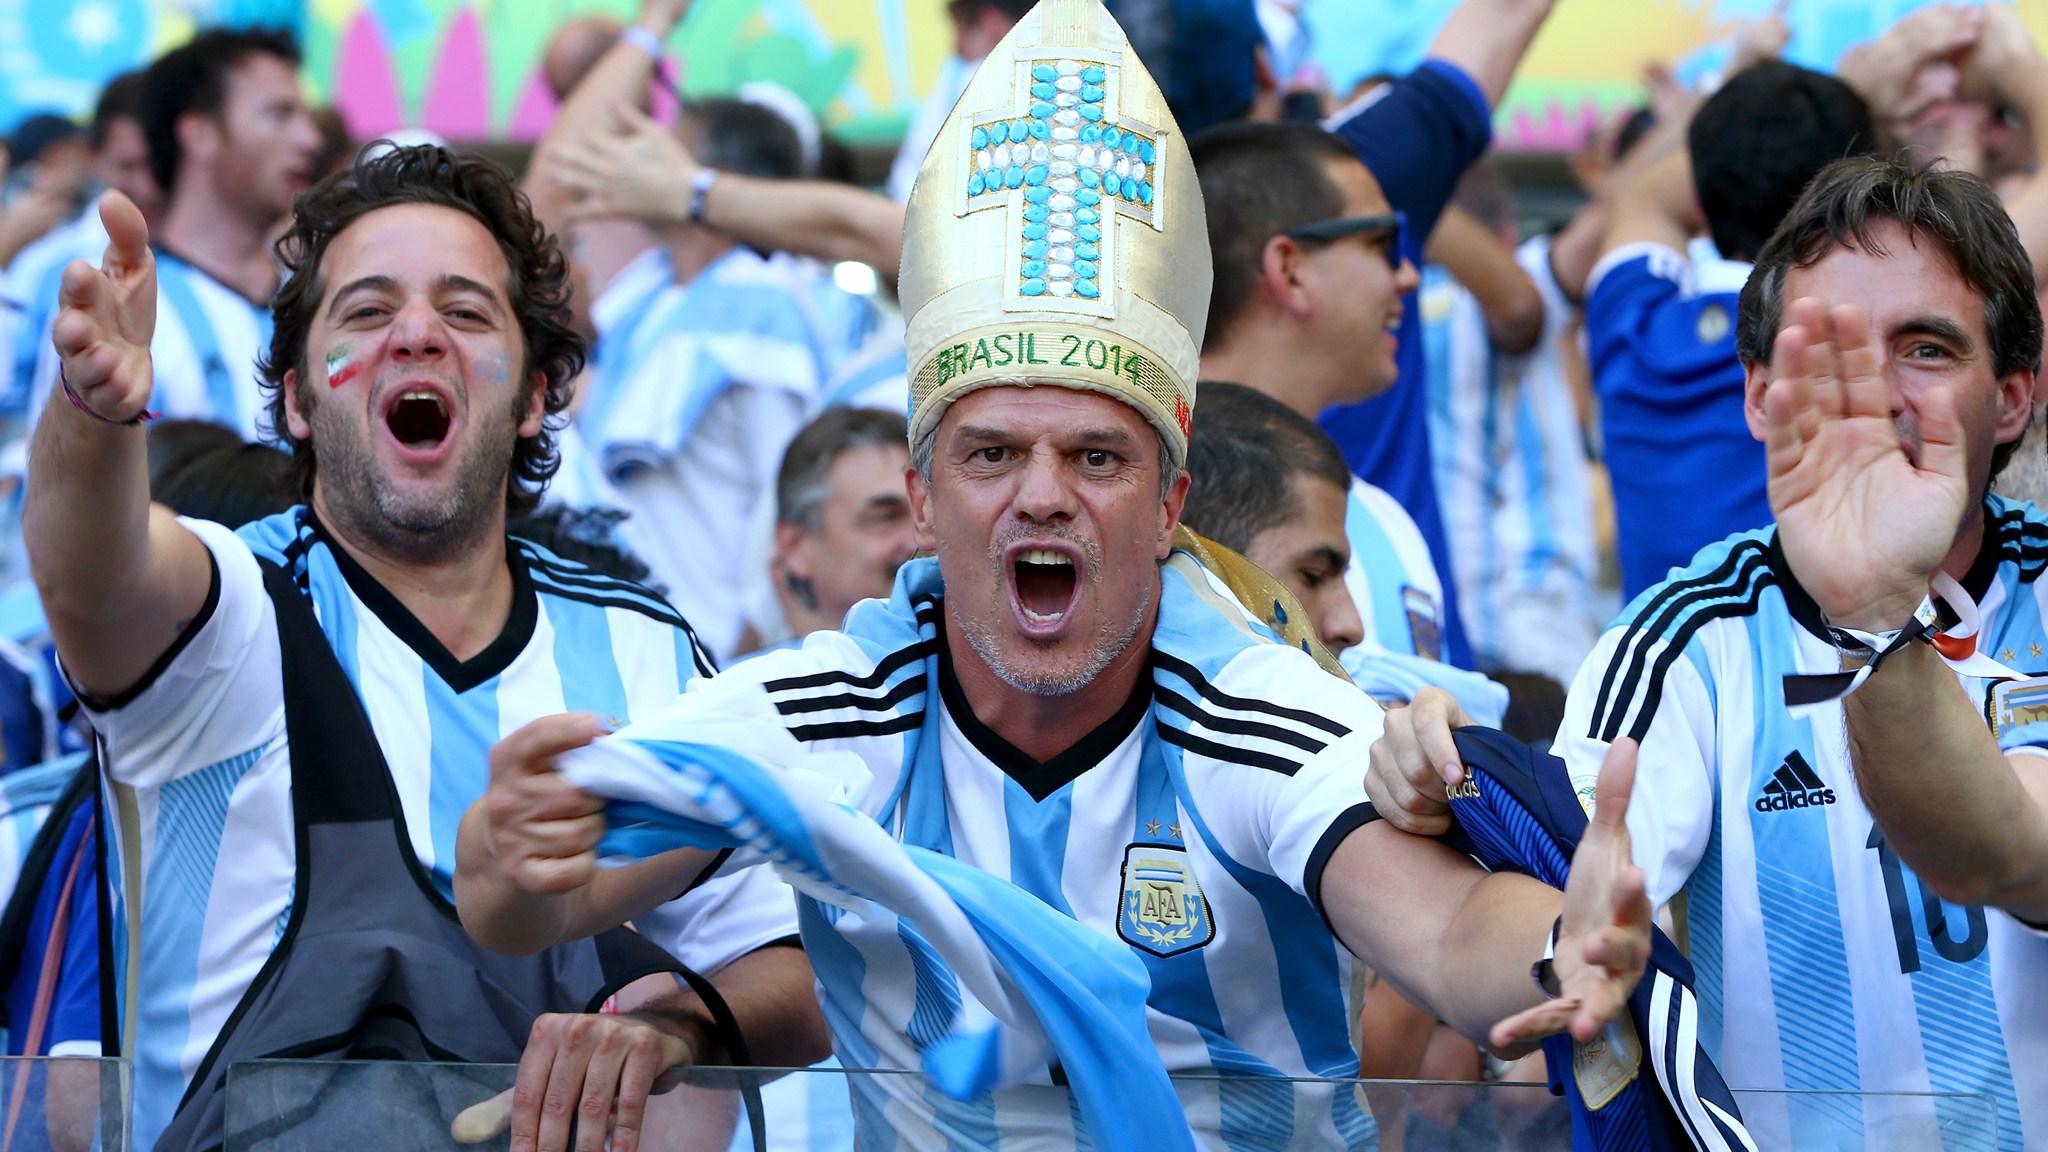 Книги фото, смешные картинки про аргентину